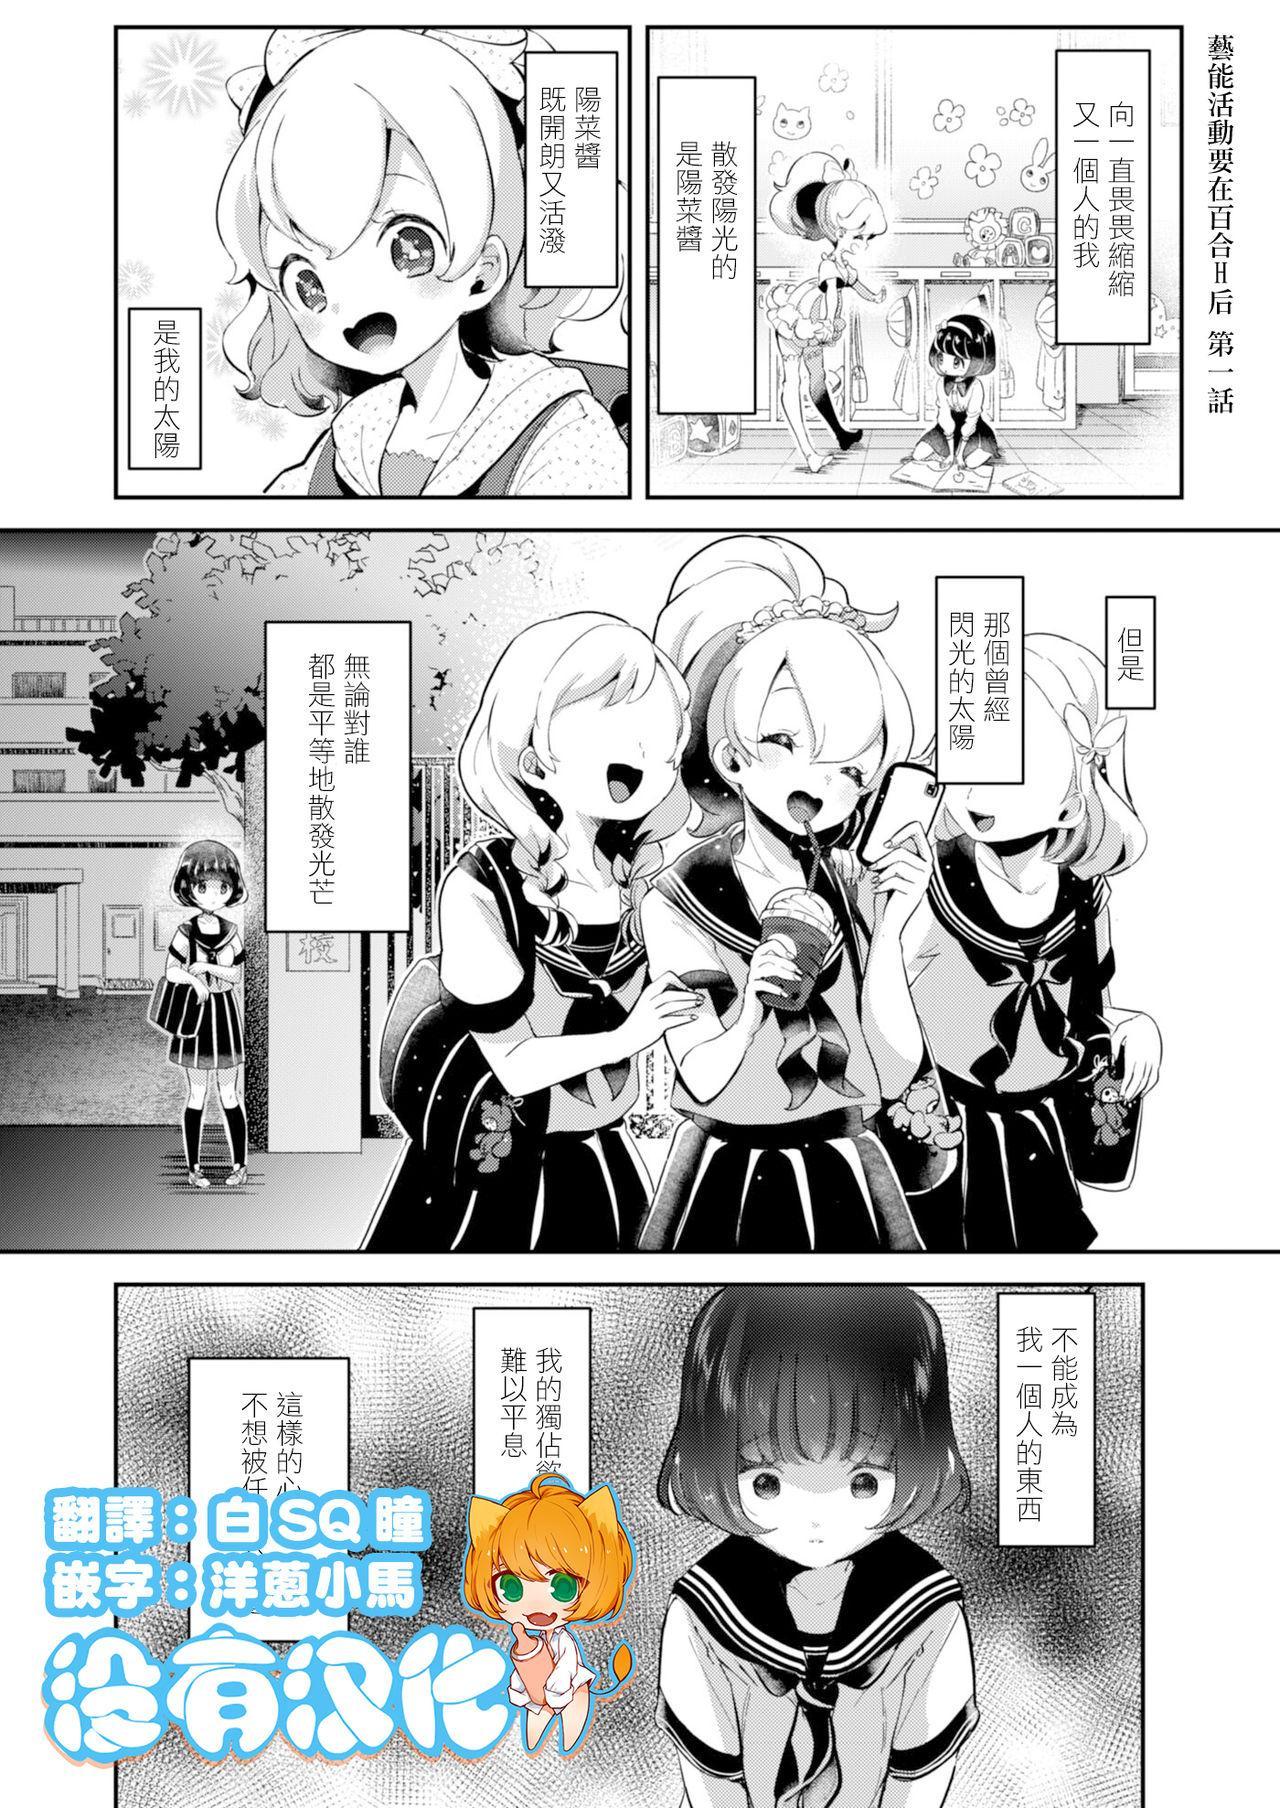 [Cyori Mokki] Geinou  Katsudou wa Yuri Ecchi no atode ch.1-3 丨藝能活動要在百合H後 第1-2話  [Chinese] [沒有漢化] [Digital] 0